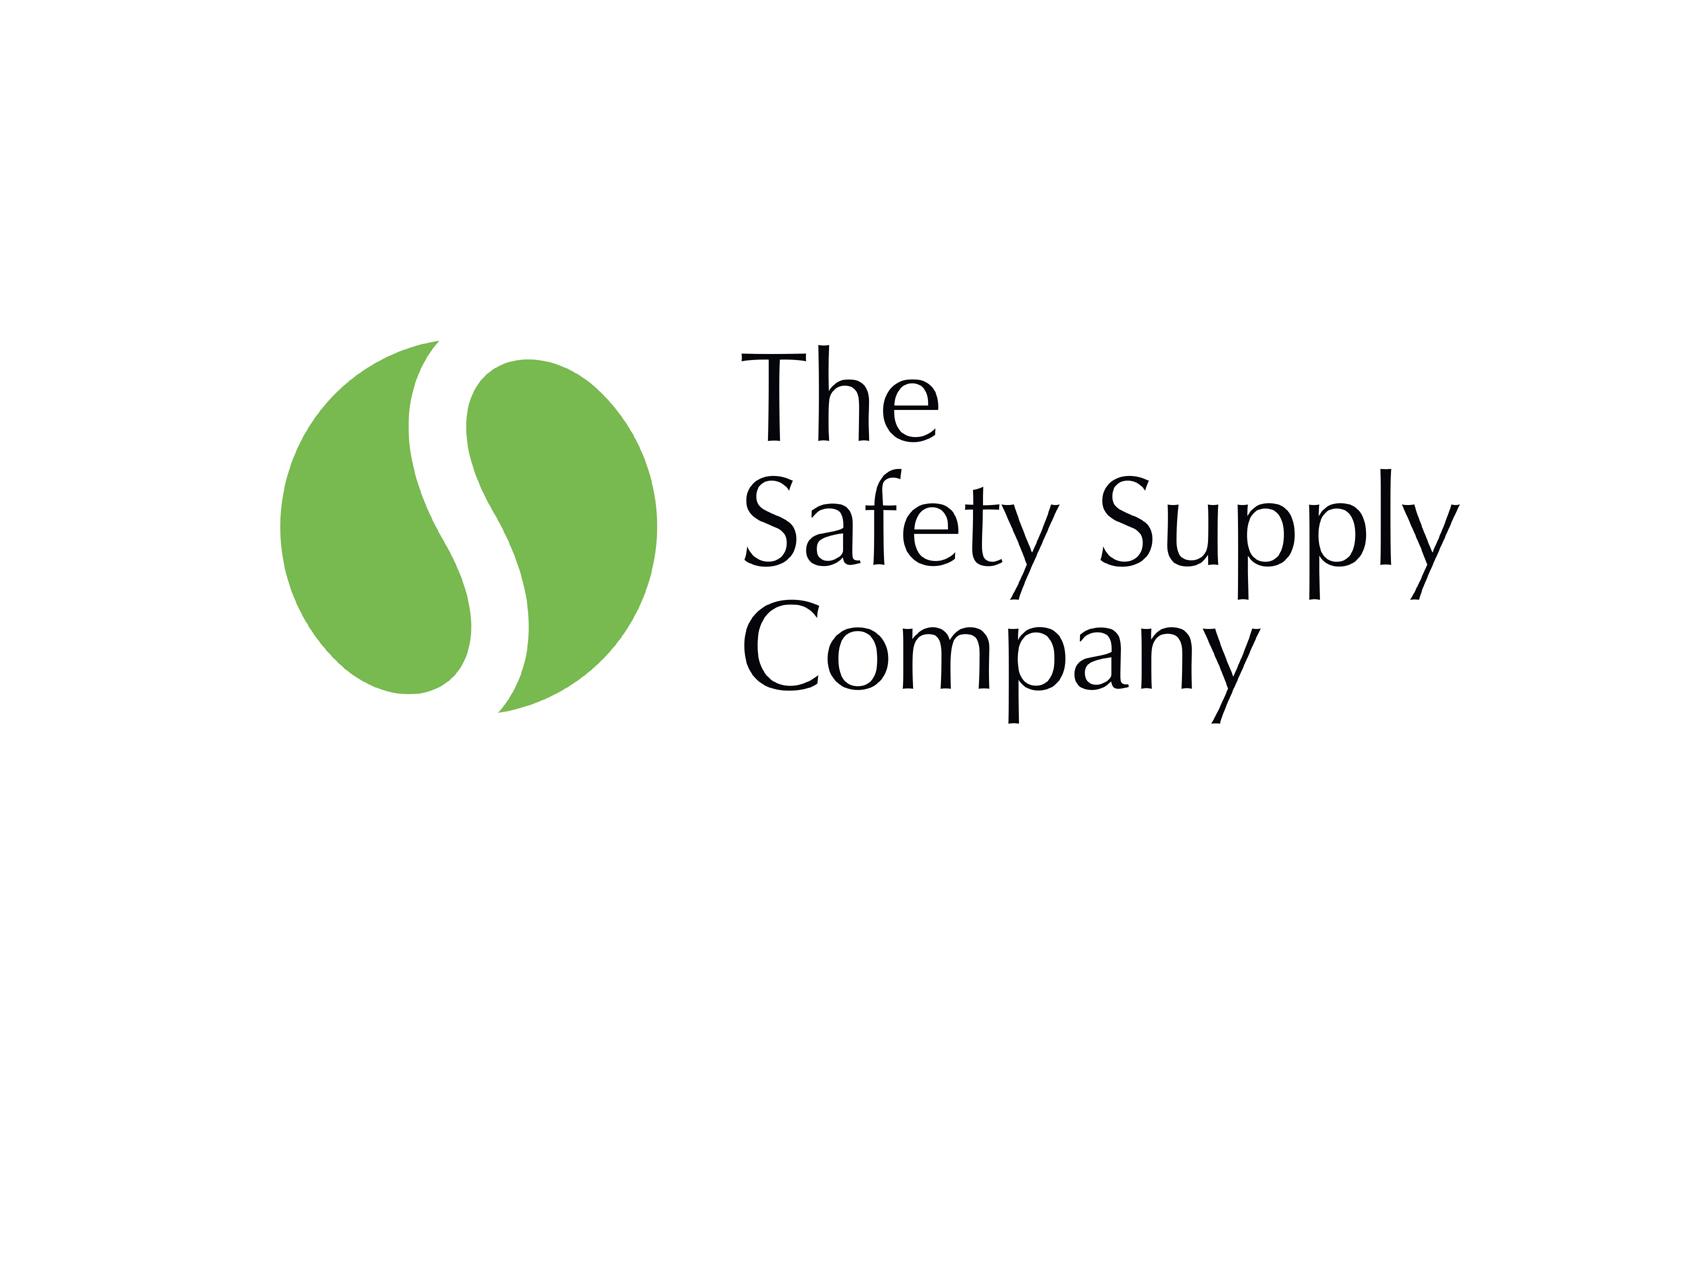 The Safety Supply Company logo